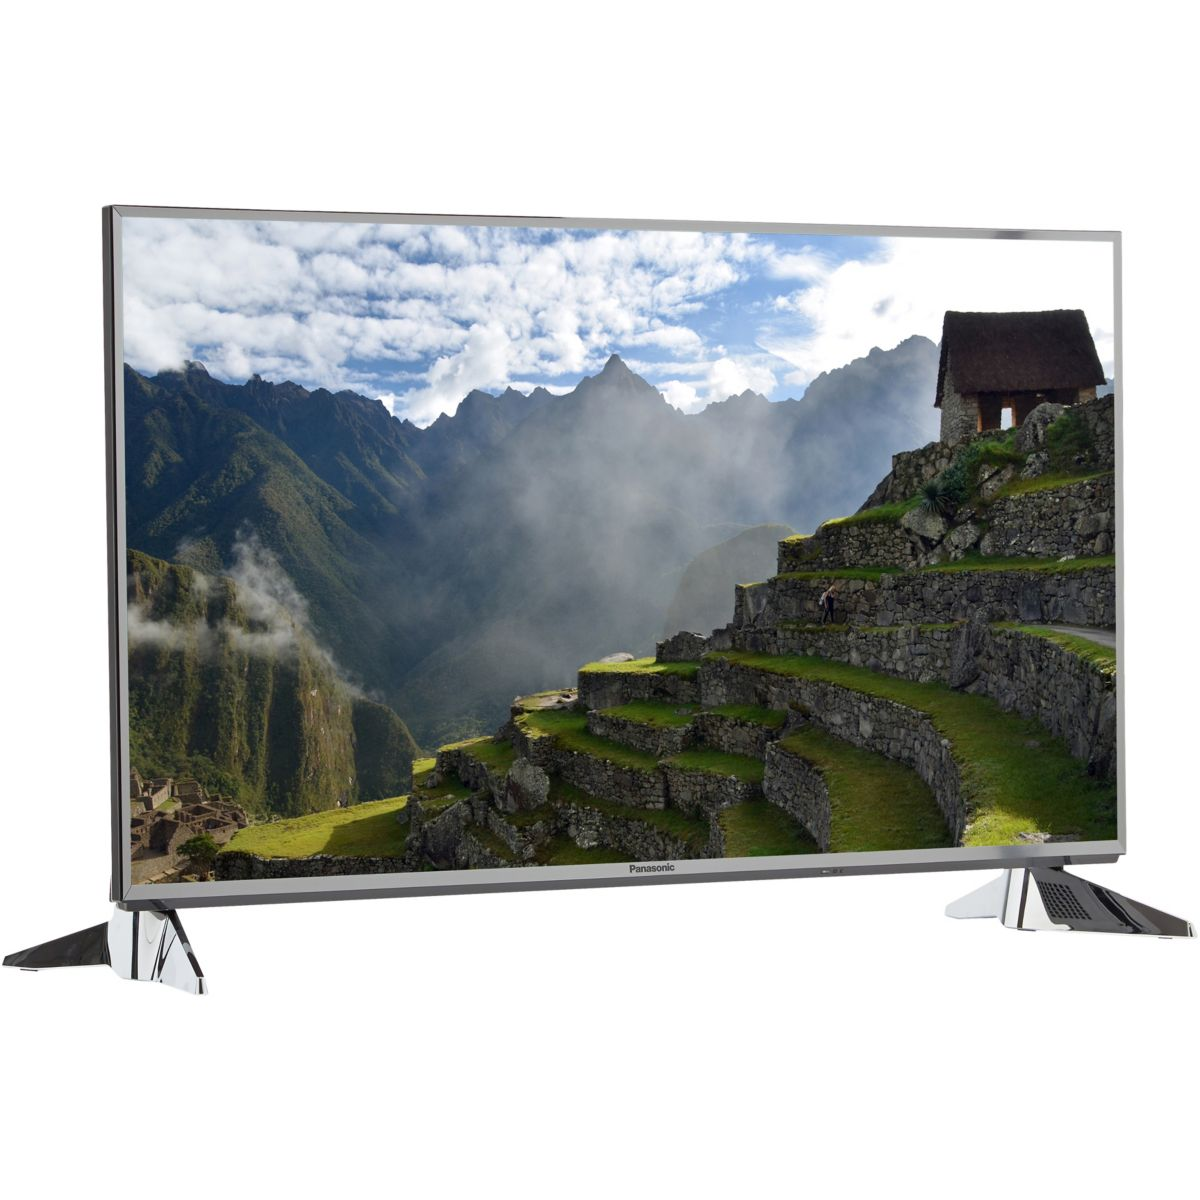 TV PANASONIC TX-40EX610 1500 BMR 4K HDR